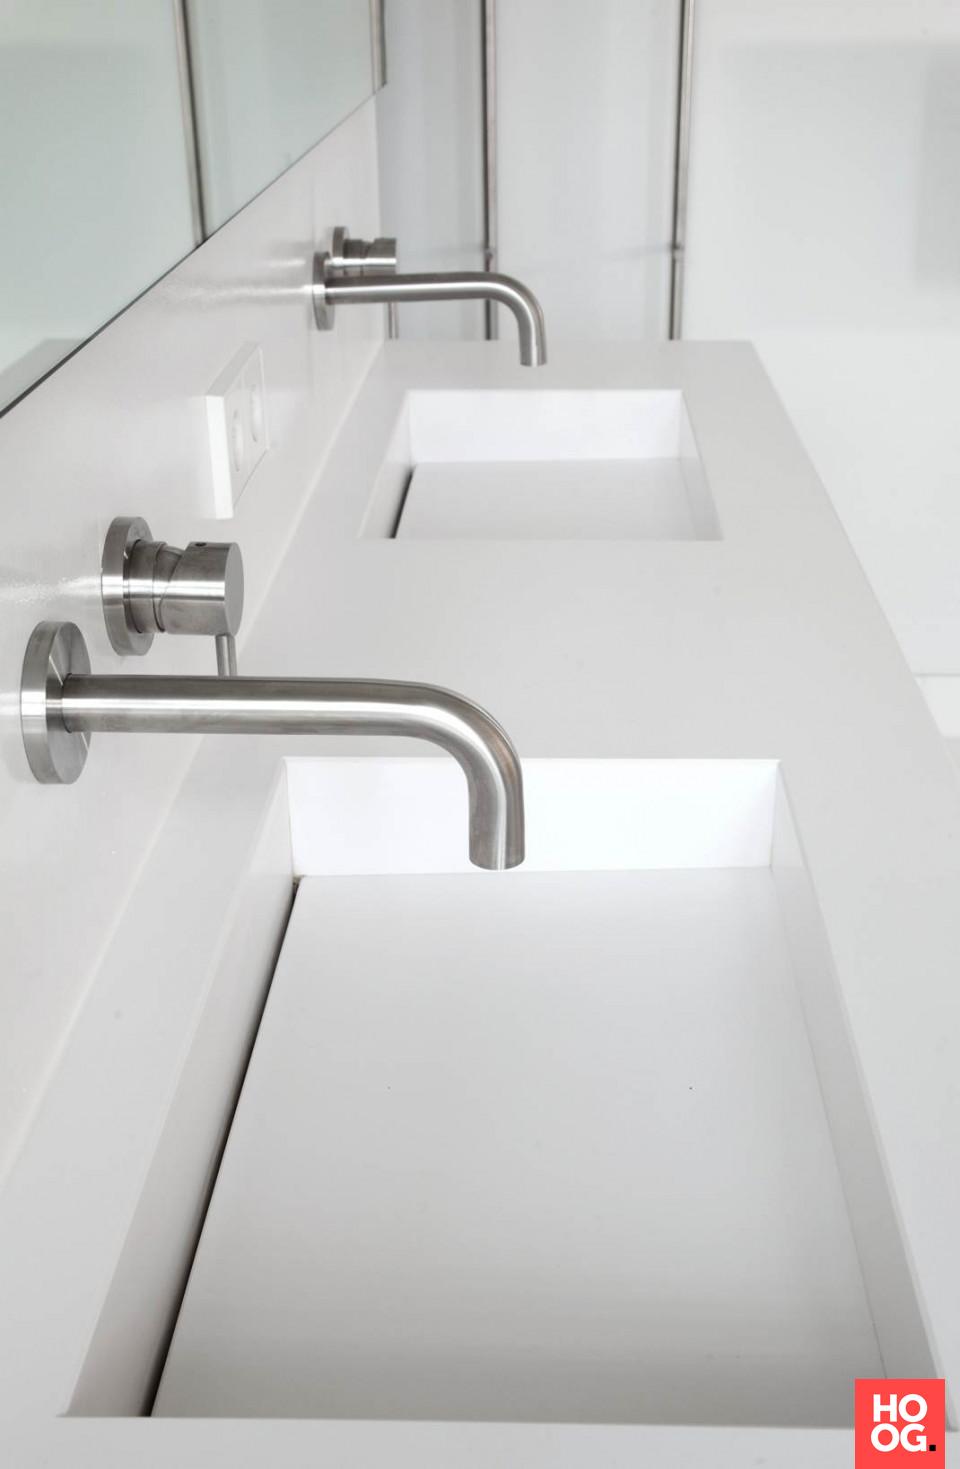 Design badkamermeubel met dubbele wasbak   badkamer ideeën ...